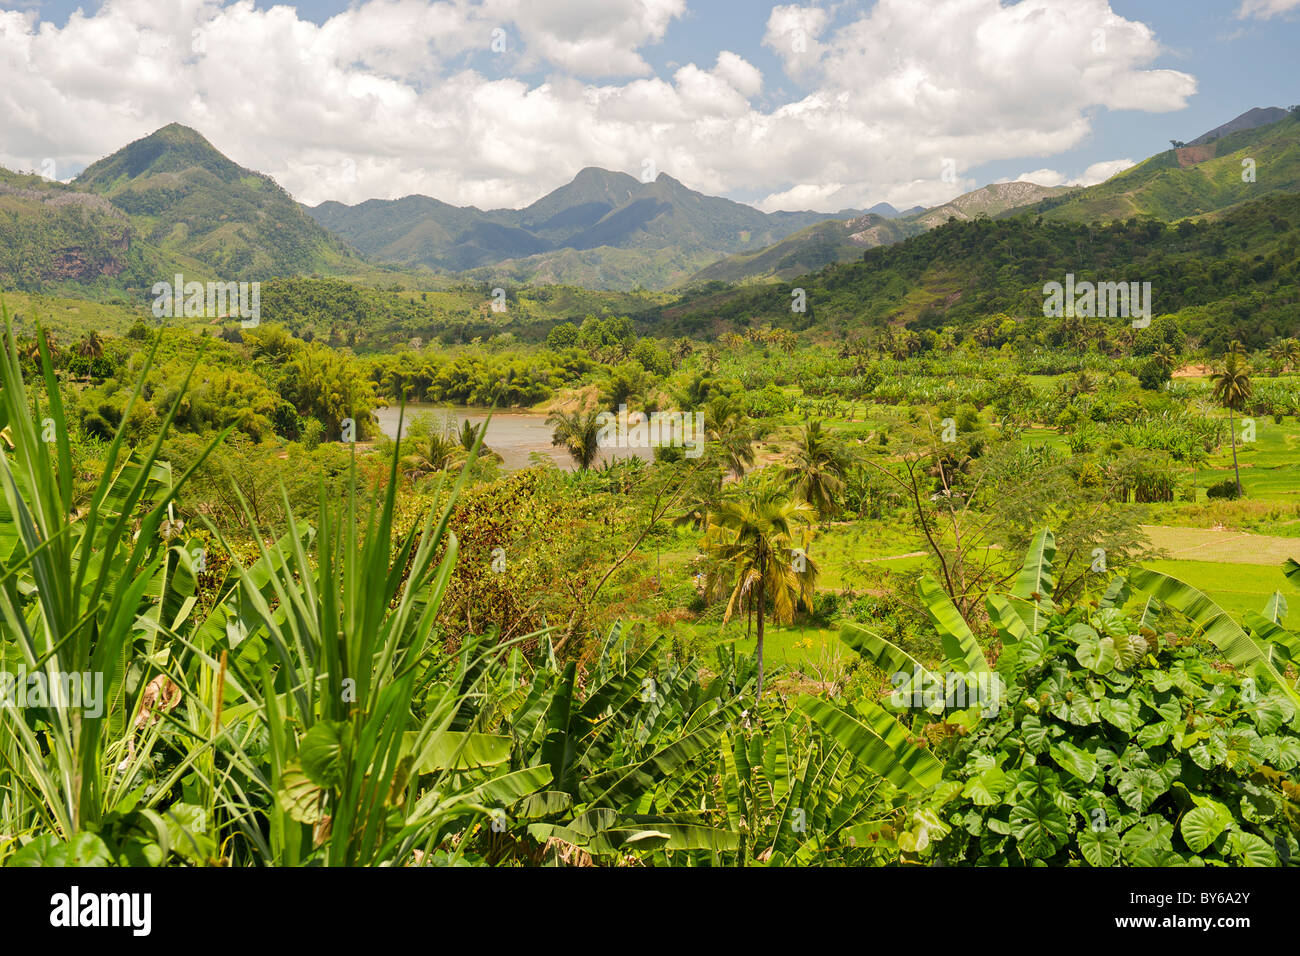 Blick auf den Lokoho River und tropische Landschaft entlang der Straße Sambava Andapa Provinz Antsiranana, Stockbild